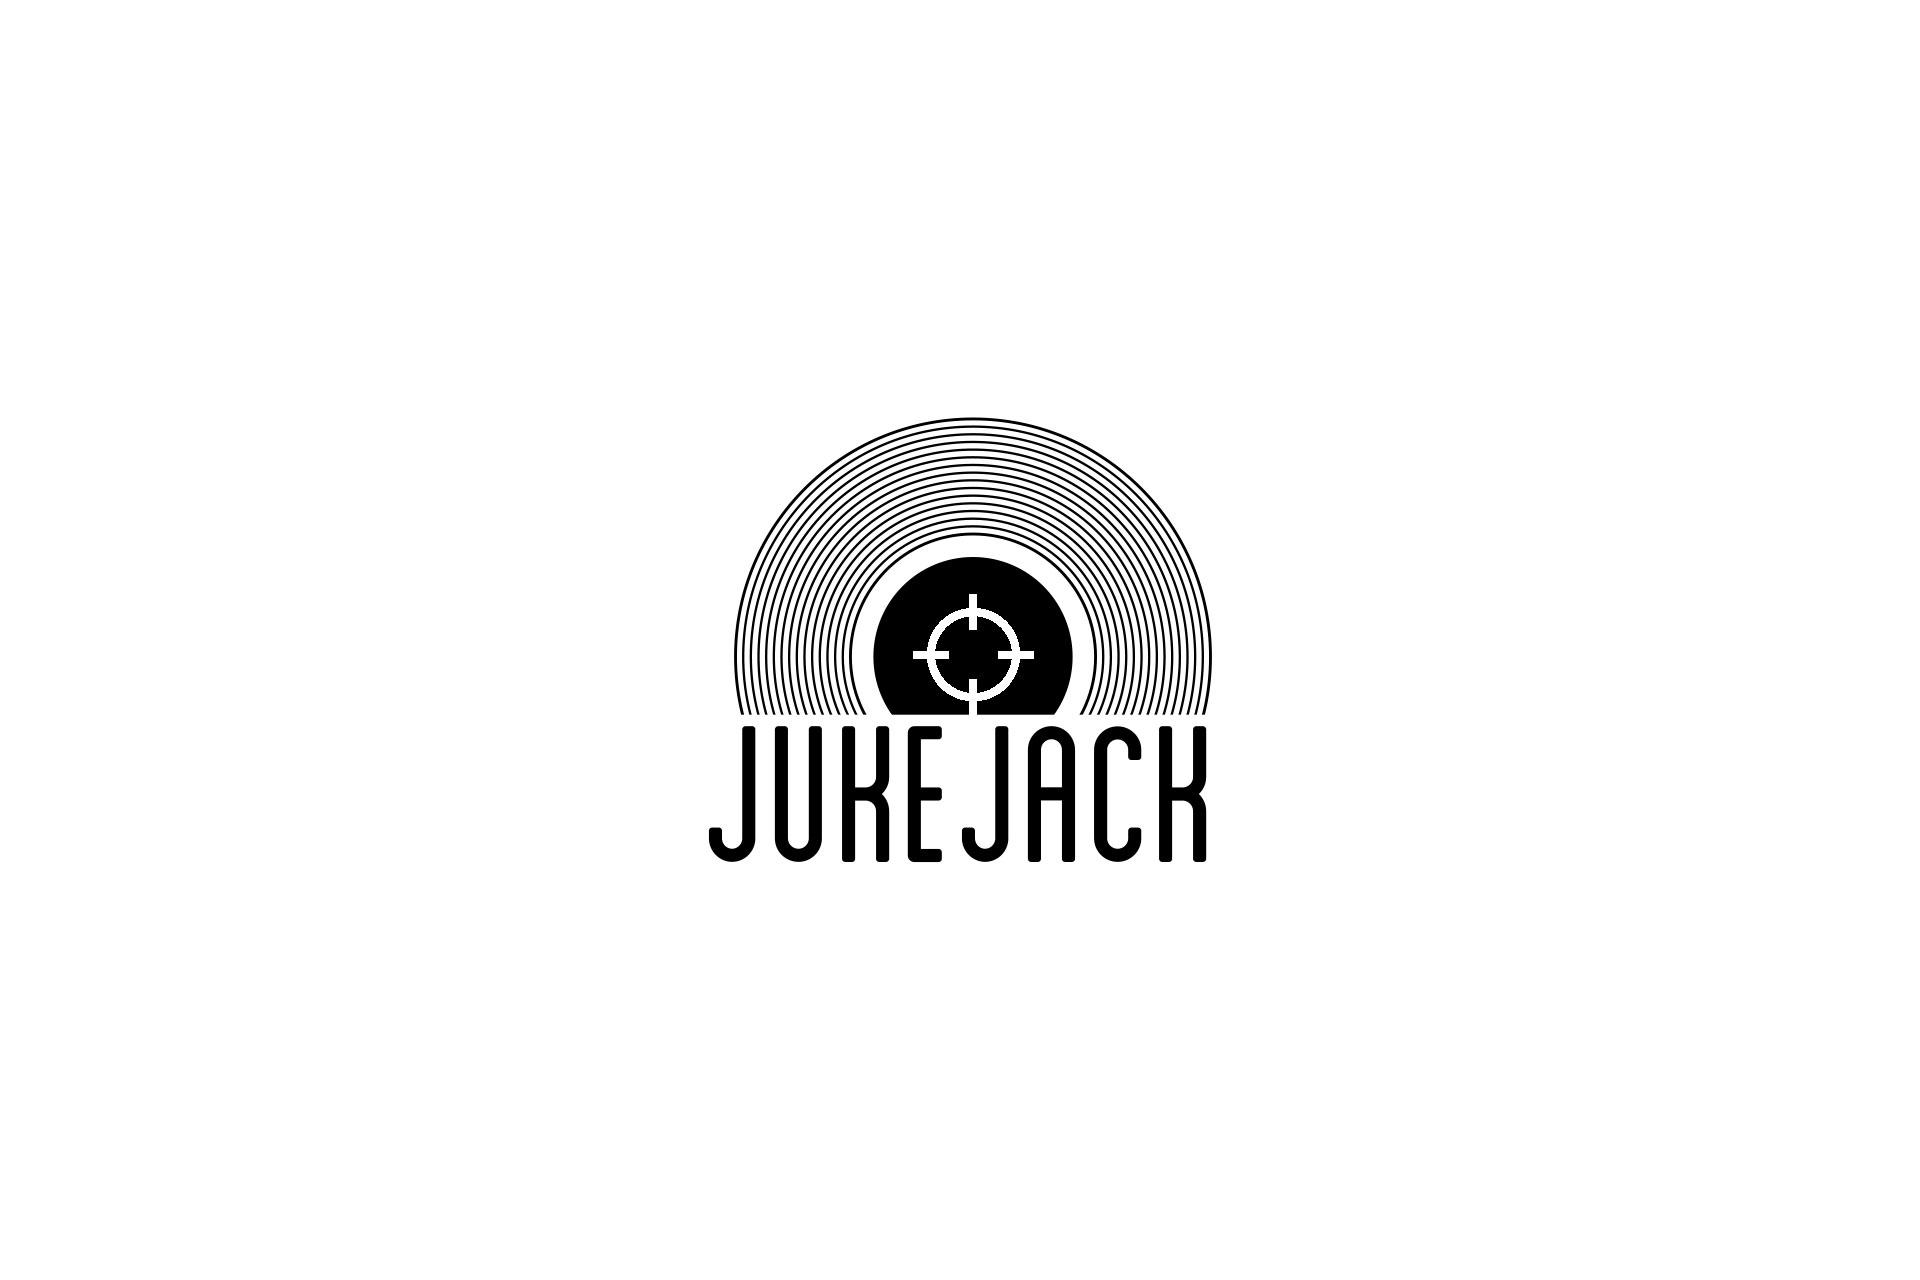 JukeJack